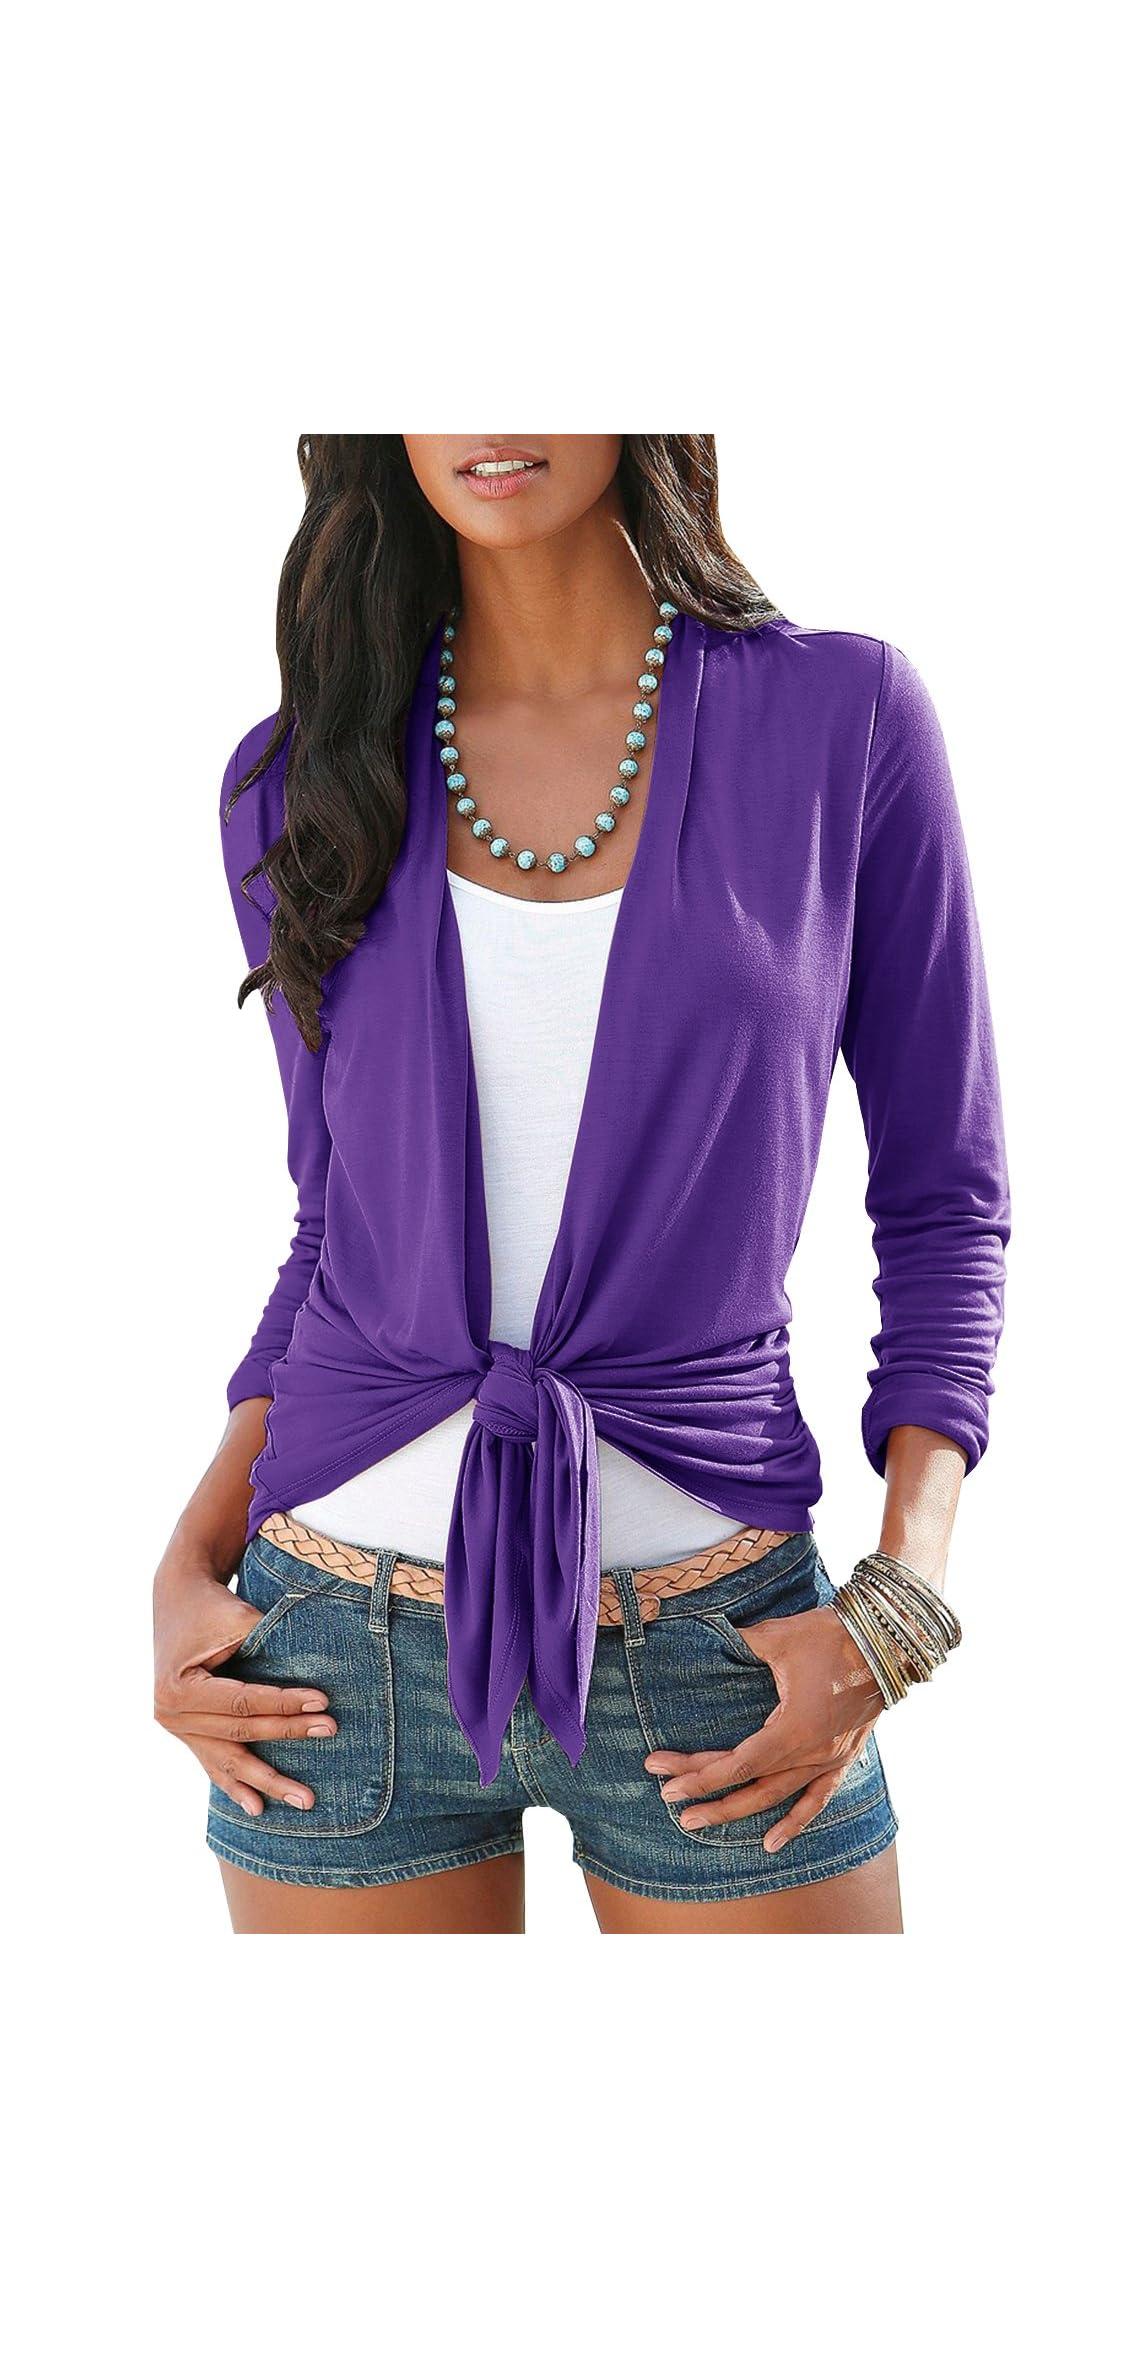 Womens Cardigans Long Sleeve Open Front Light Shawls Kimonos Tie